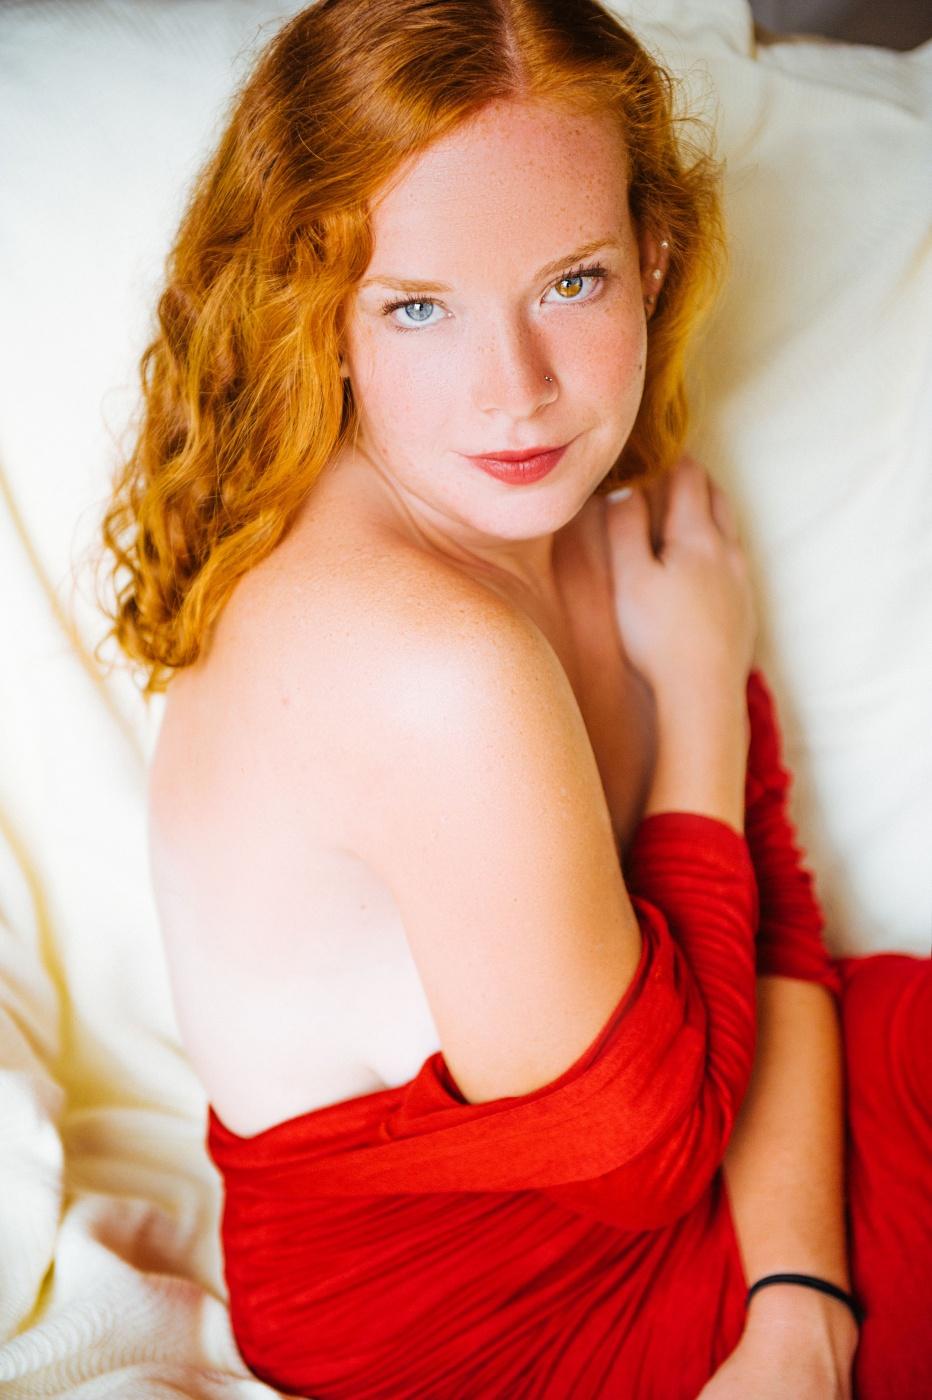 Daisy Rouge